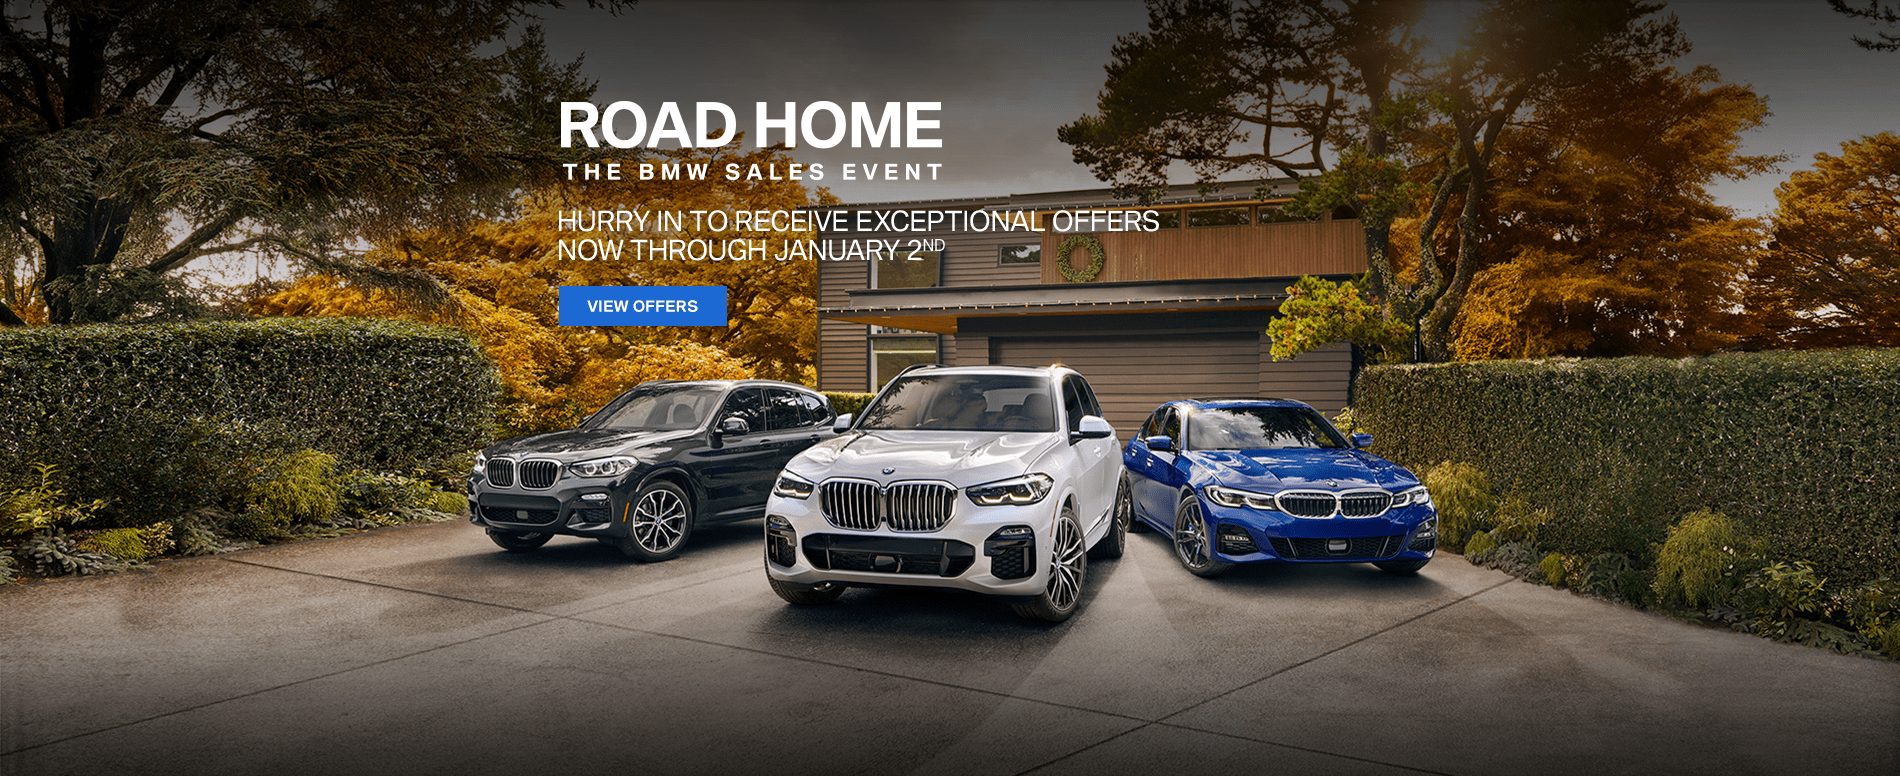 FMA1_DEC_PUSH_BMW_Road_Home_Fall_Generic